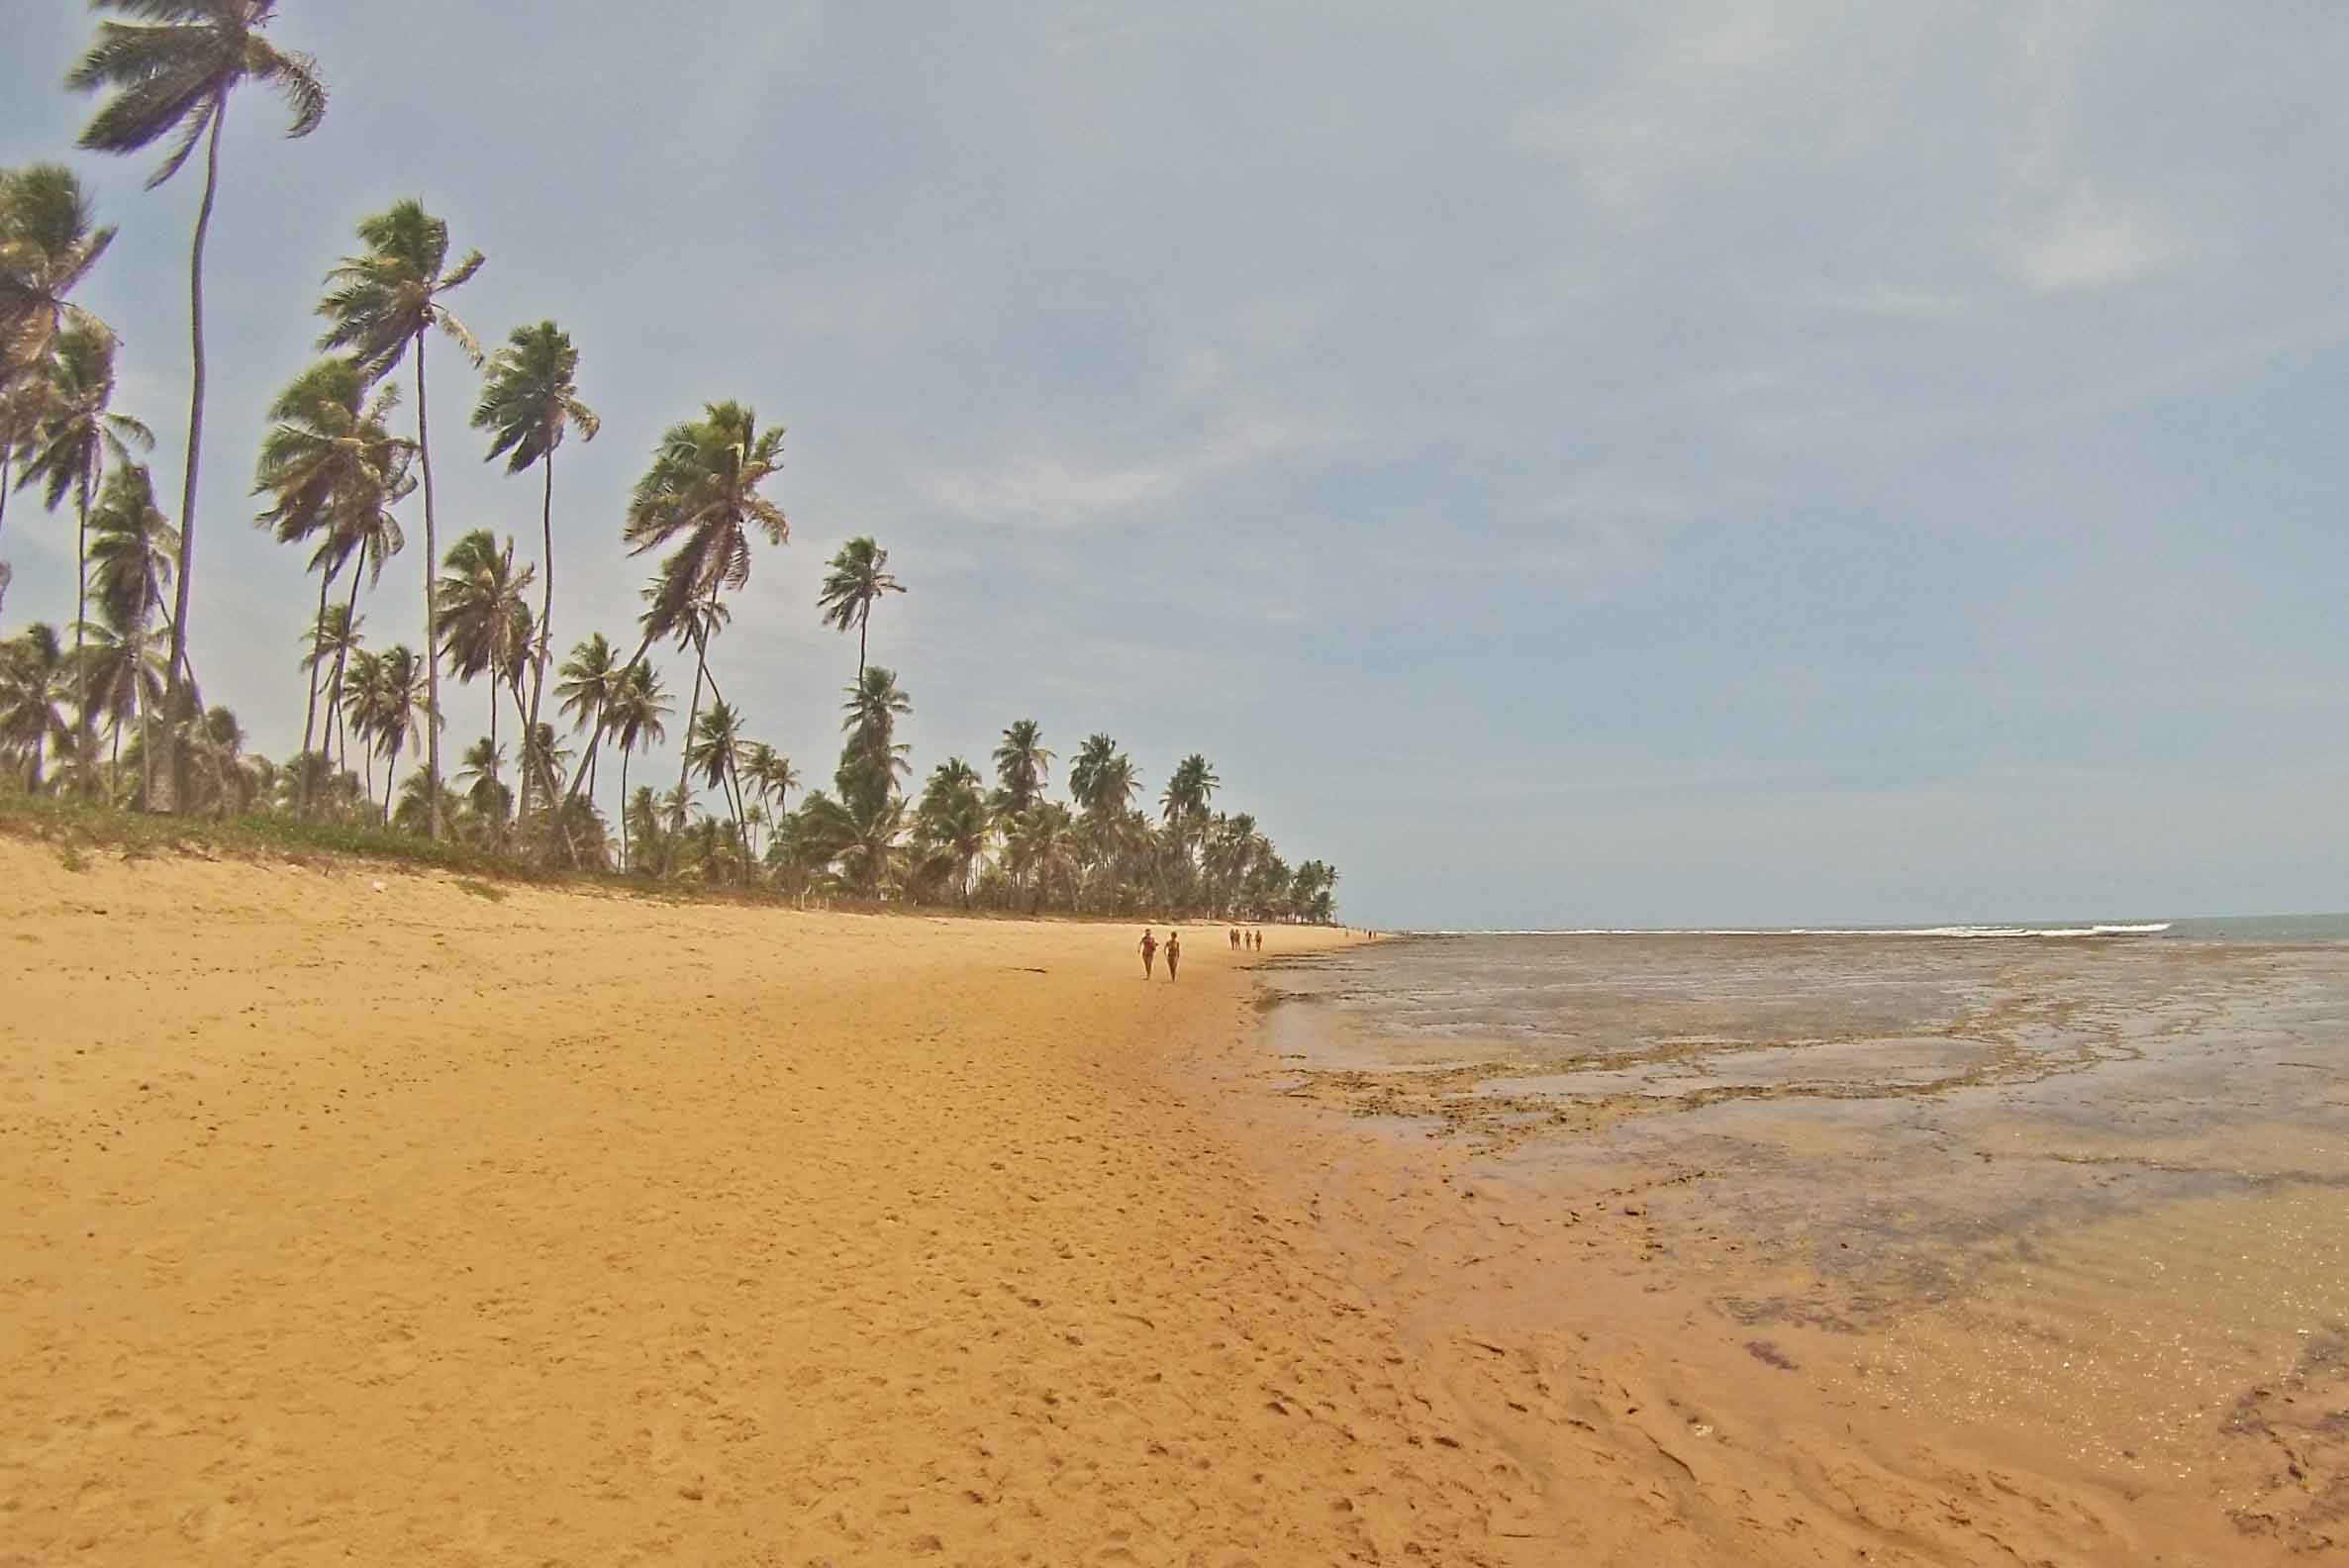 praia do forte piscinas naturais